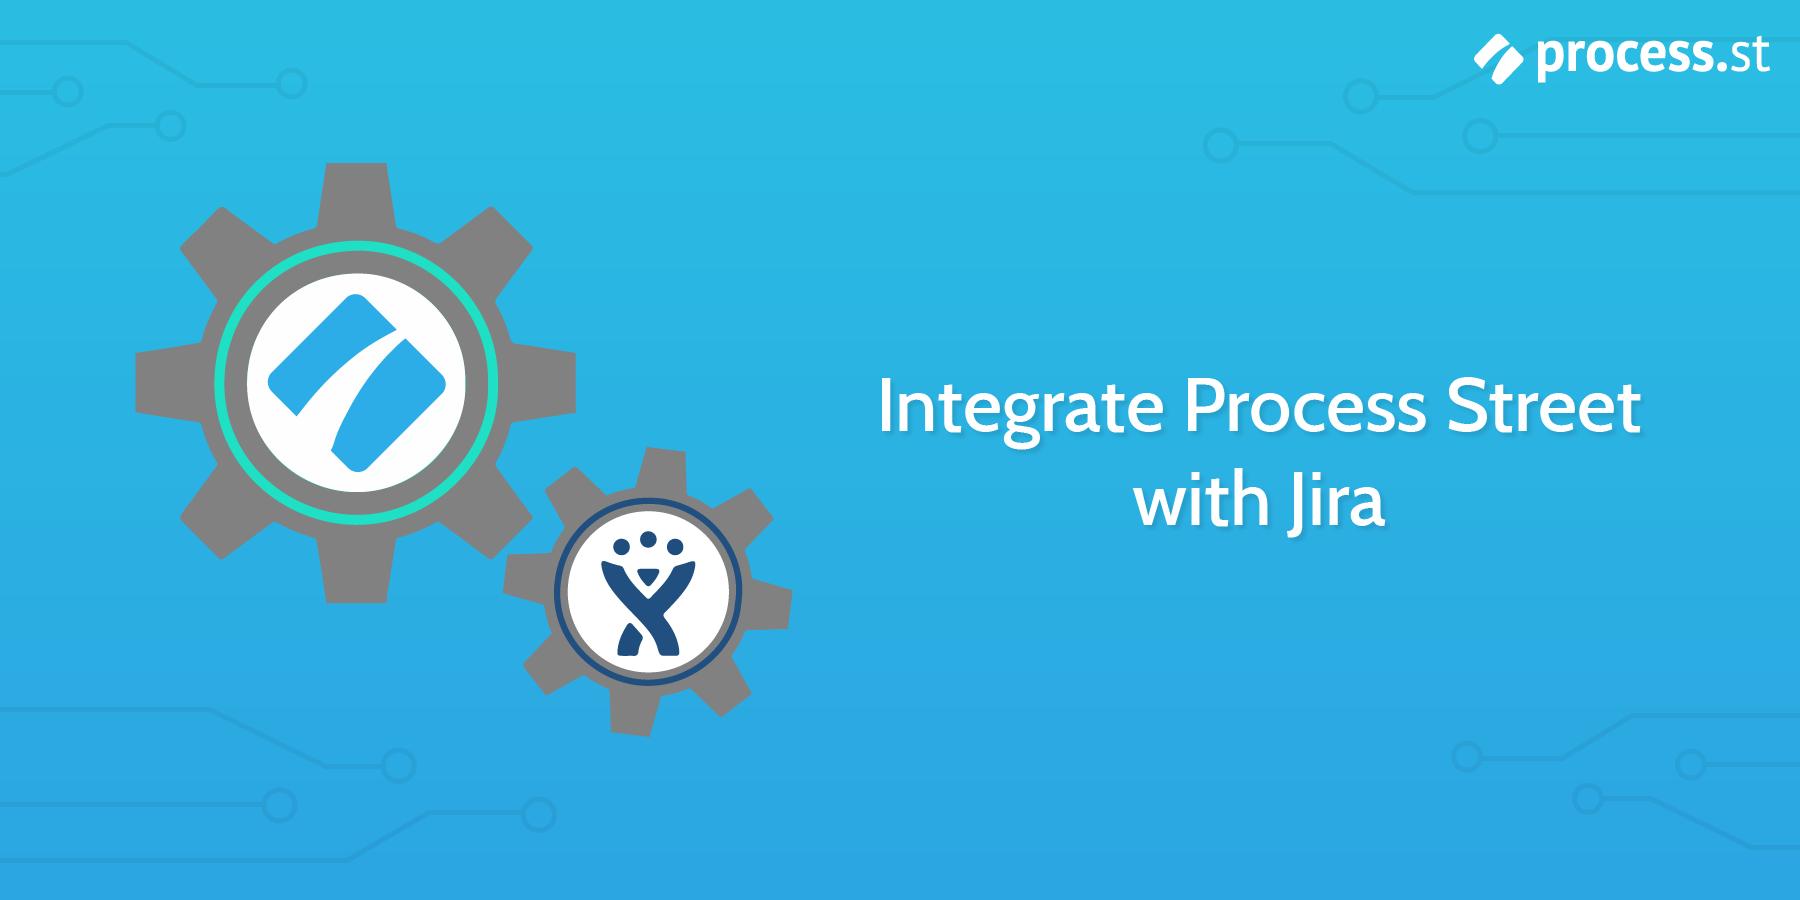 jira process street integration